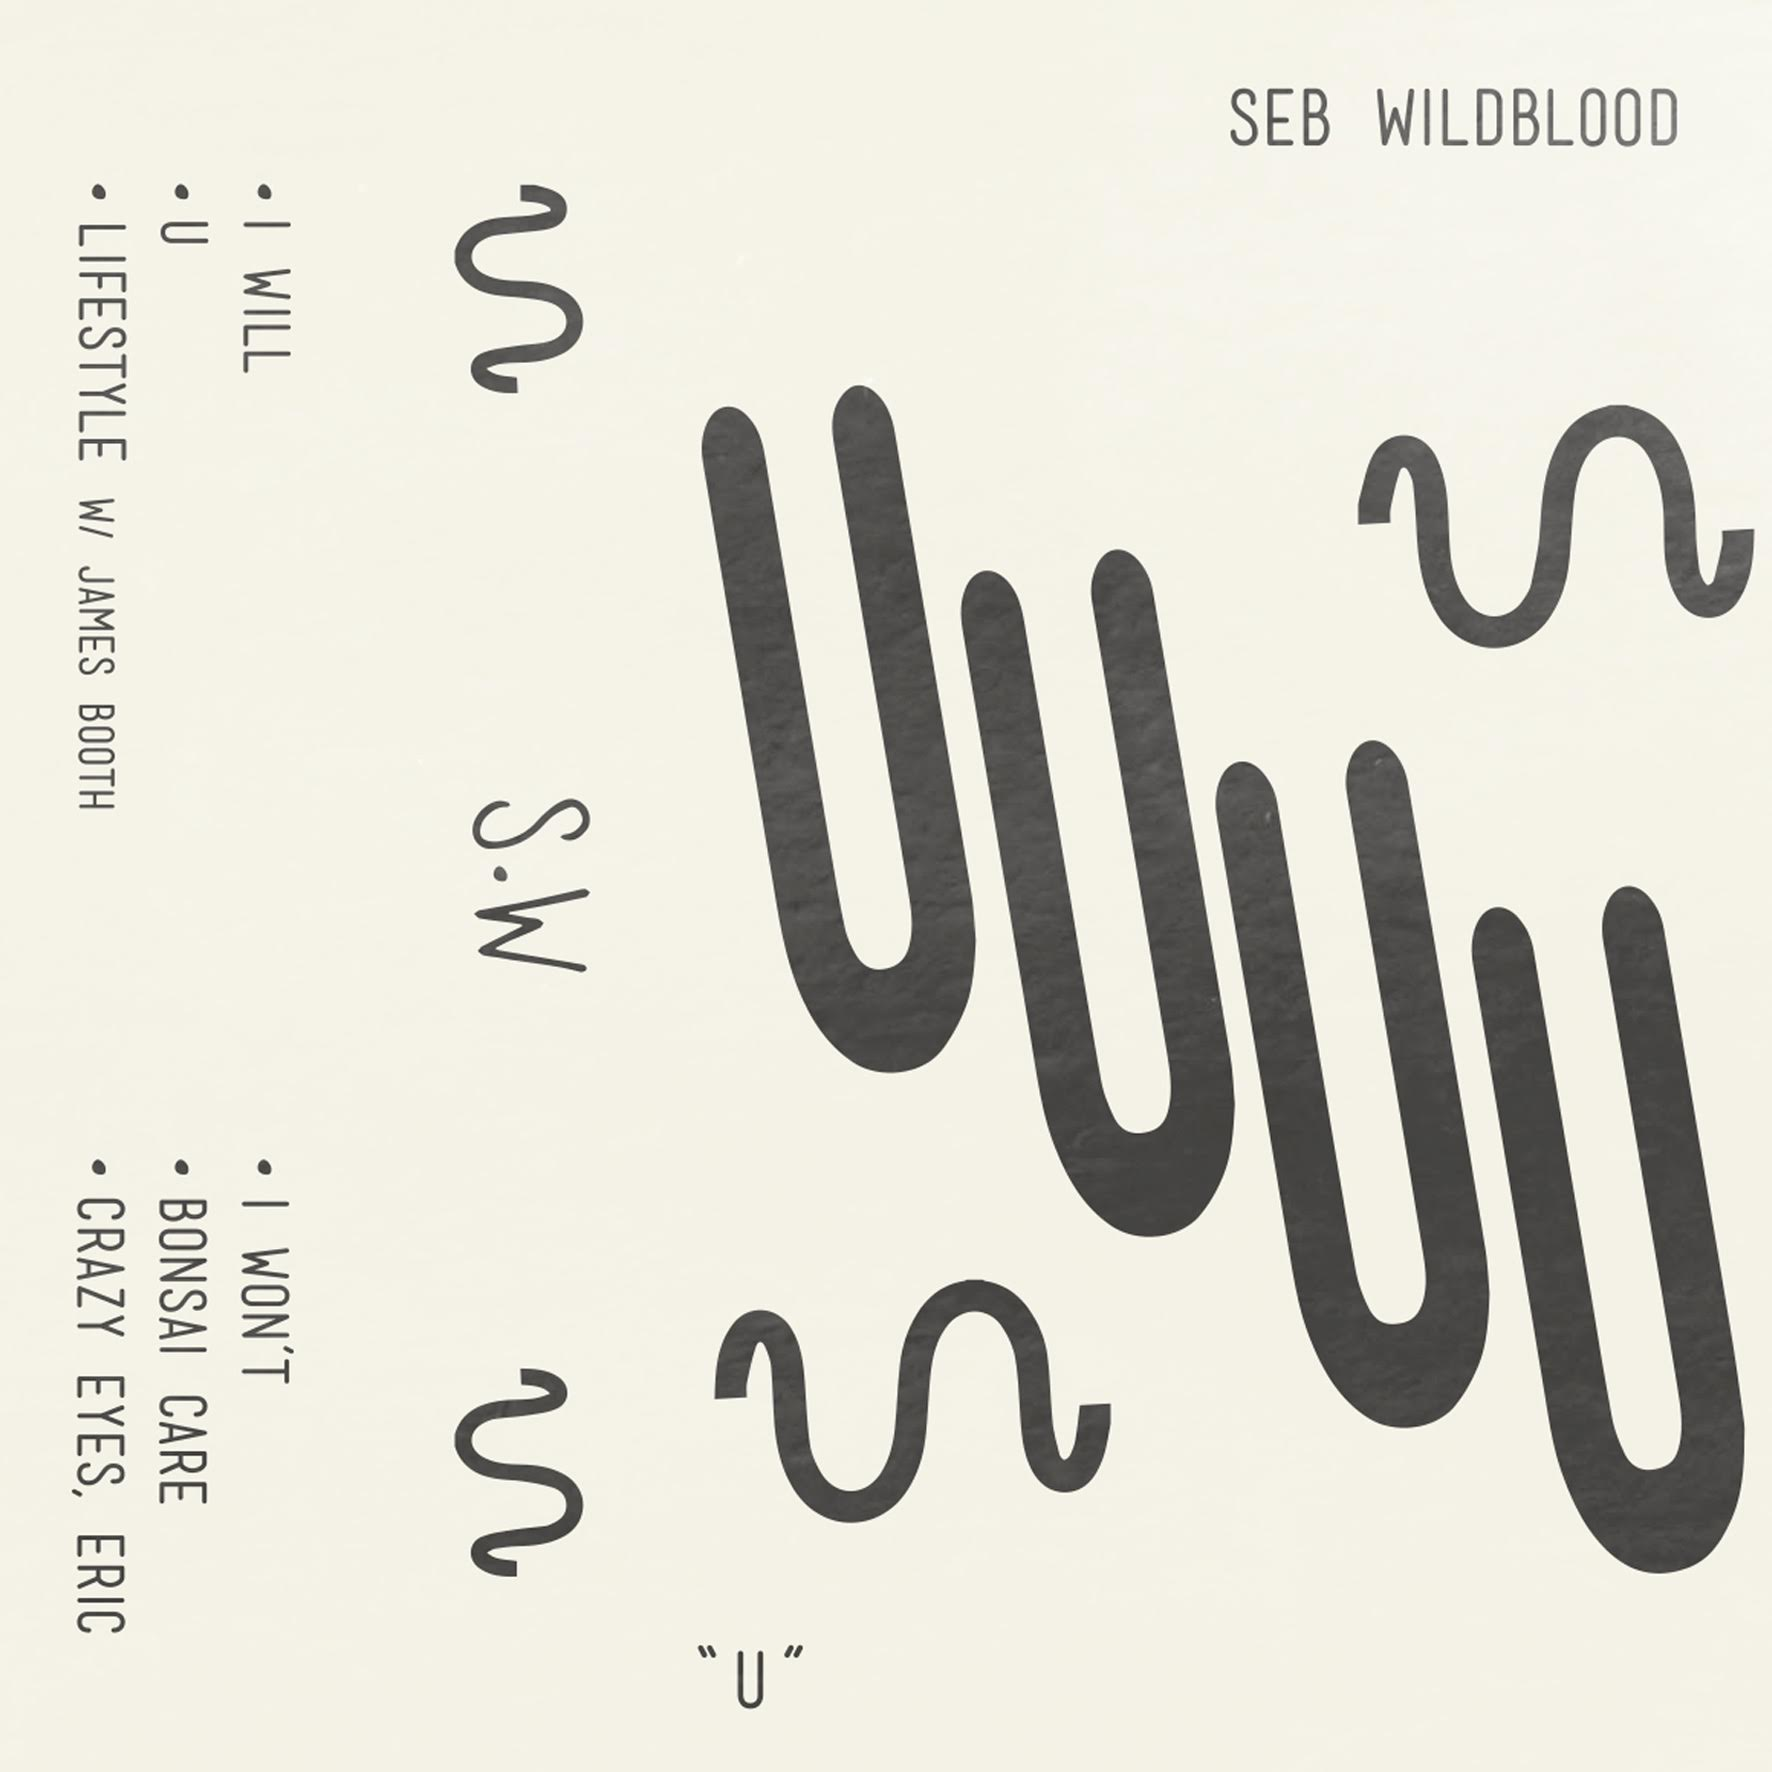 U-cassette-Seb-Wildblood-artwork